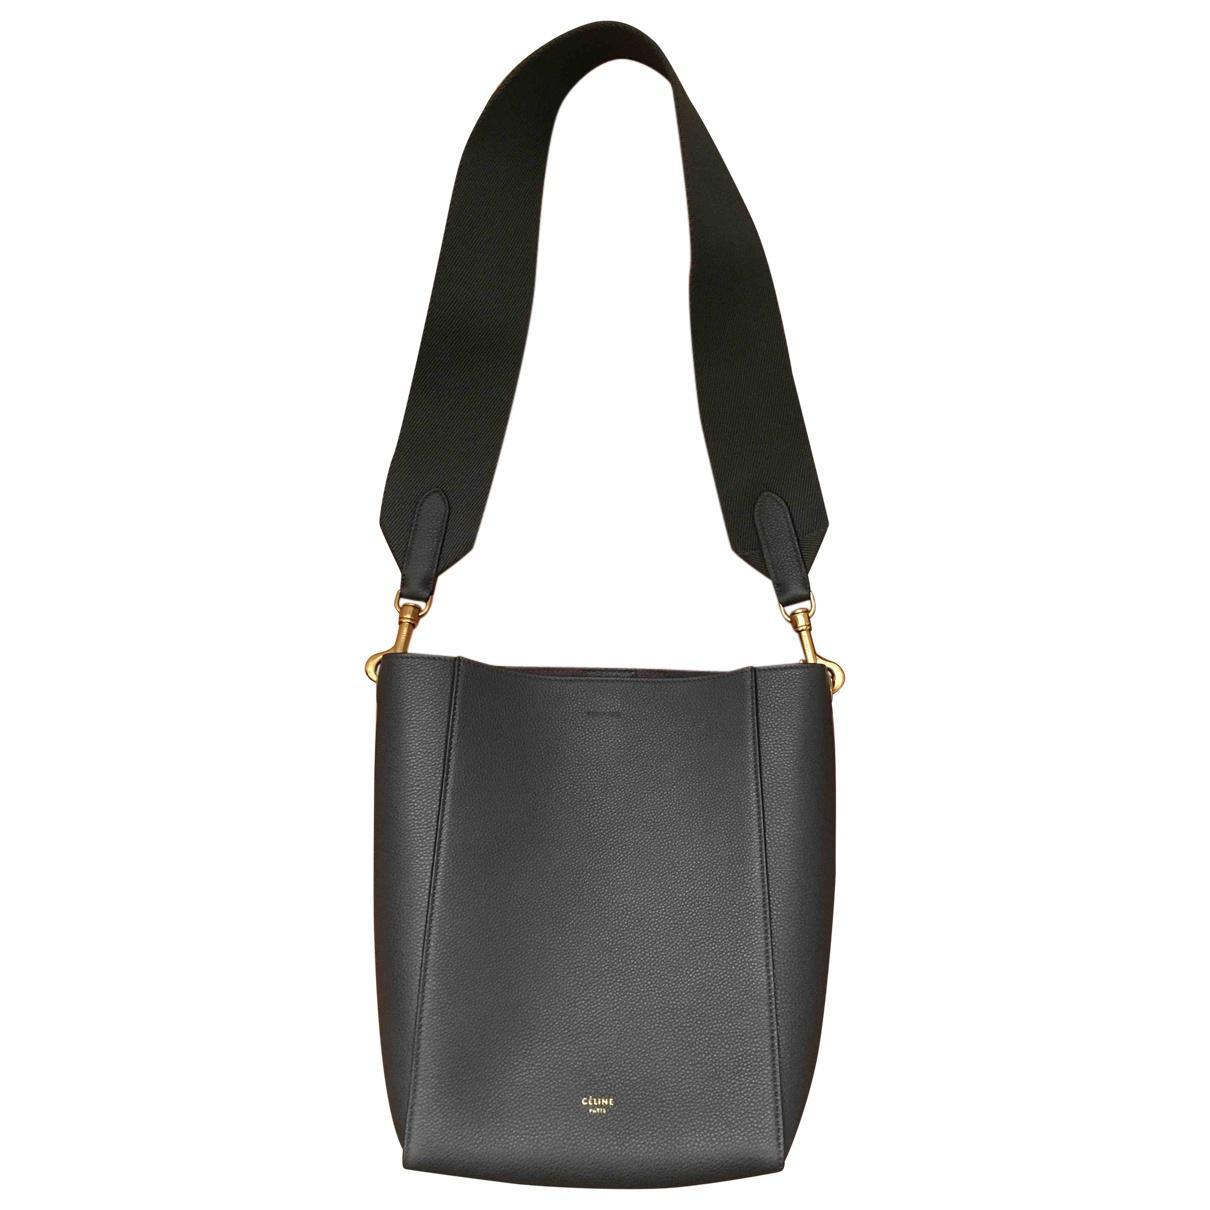 f48e3cab6601 Céline Seau Sangle Leather Handbag in Gray - Lyst